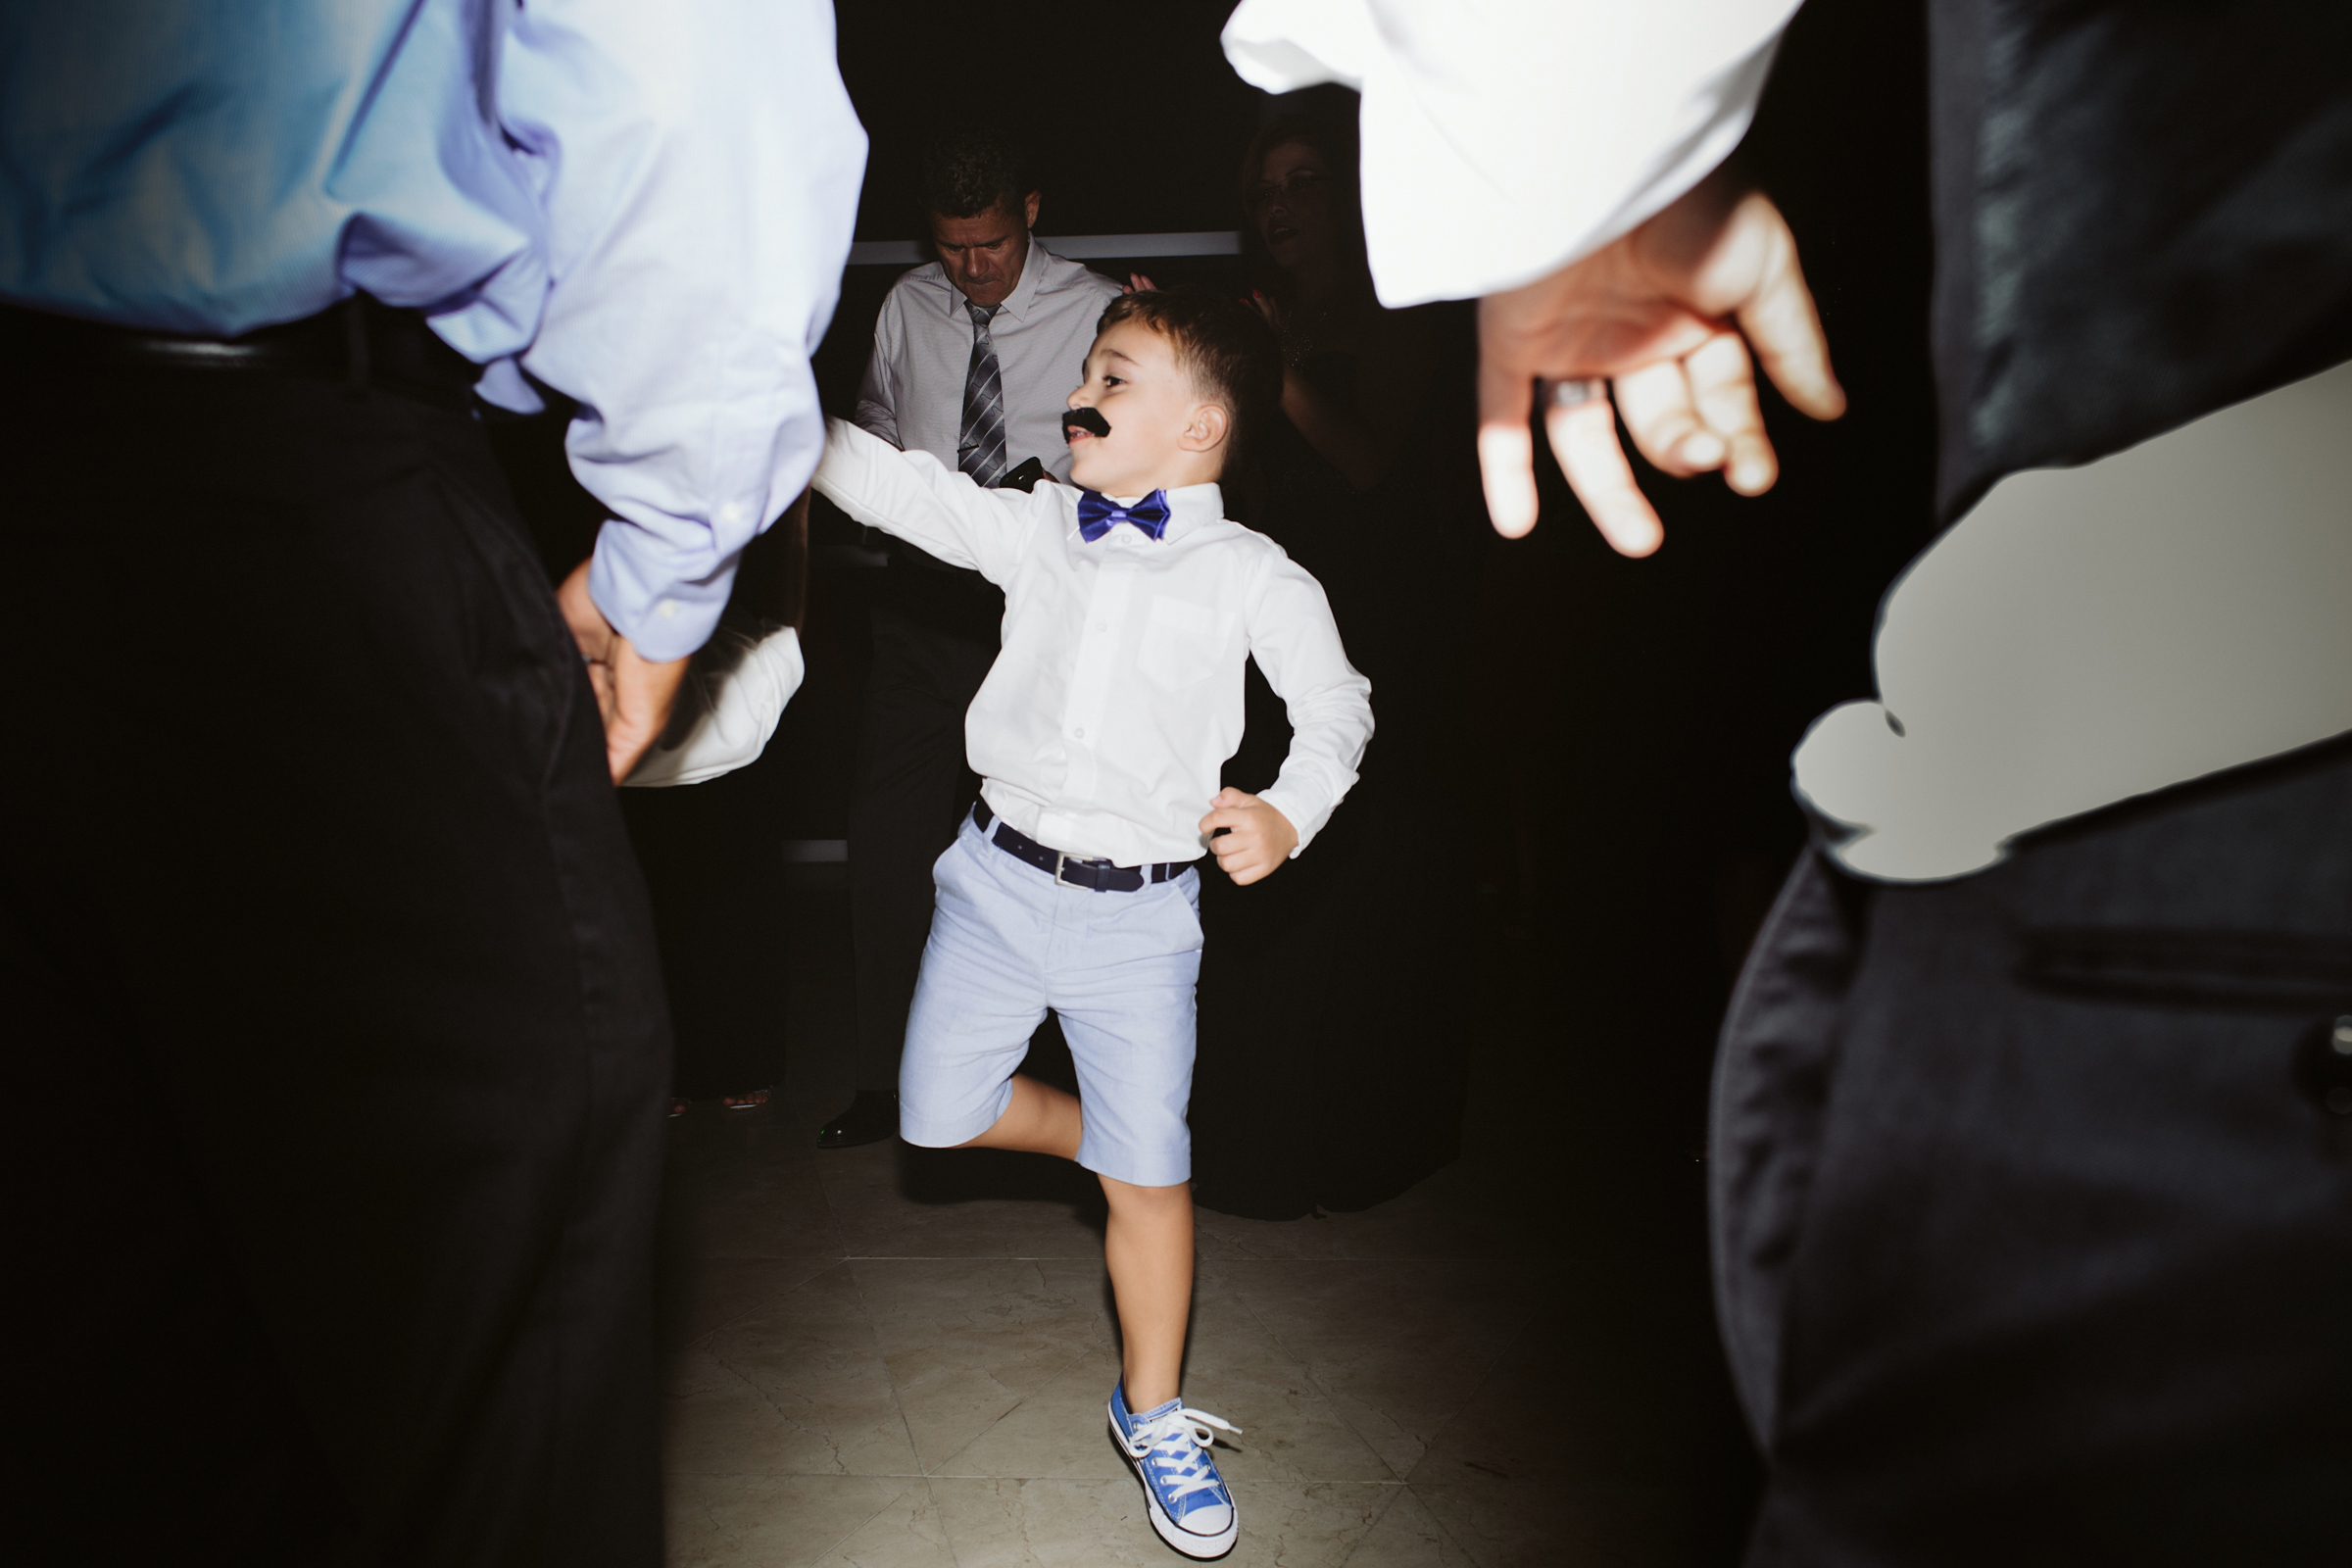 wedding day | MFA St Pete | Vanessa Boy Photography | vanessaboy.com-673.com |final.jpg